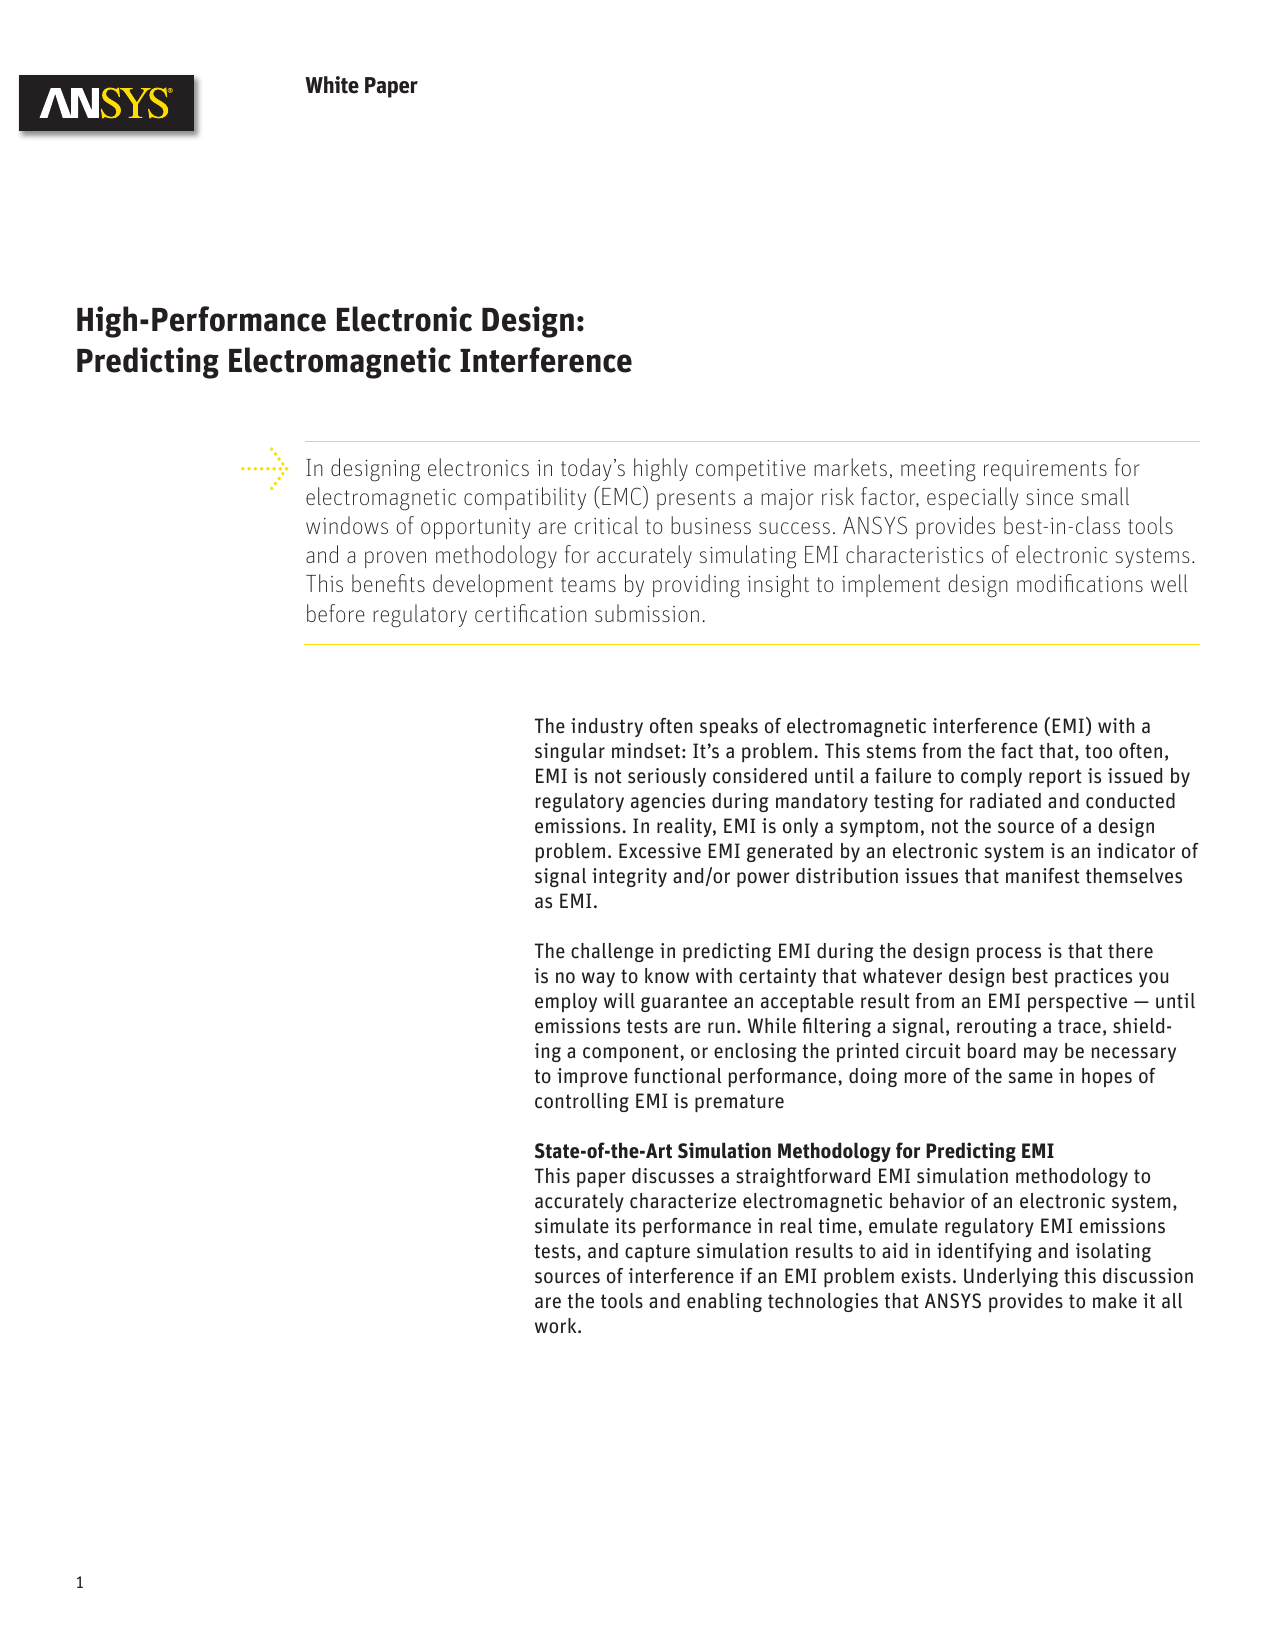 High Performance Electronic Design Predicting